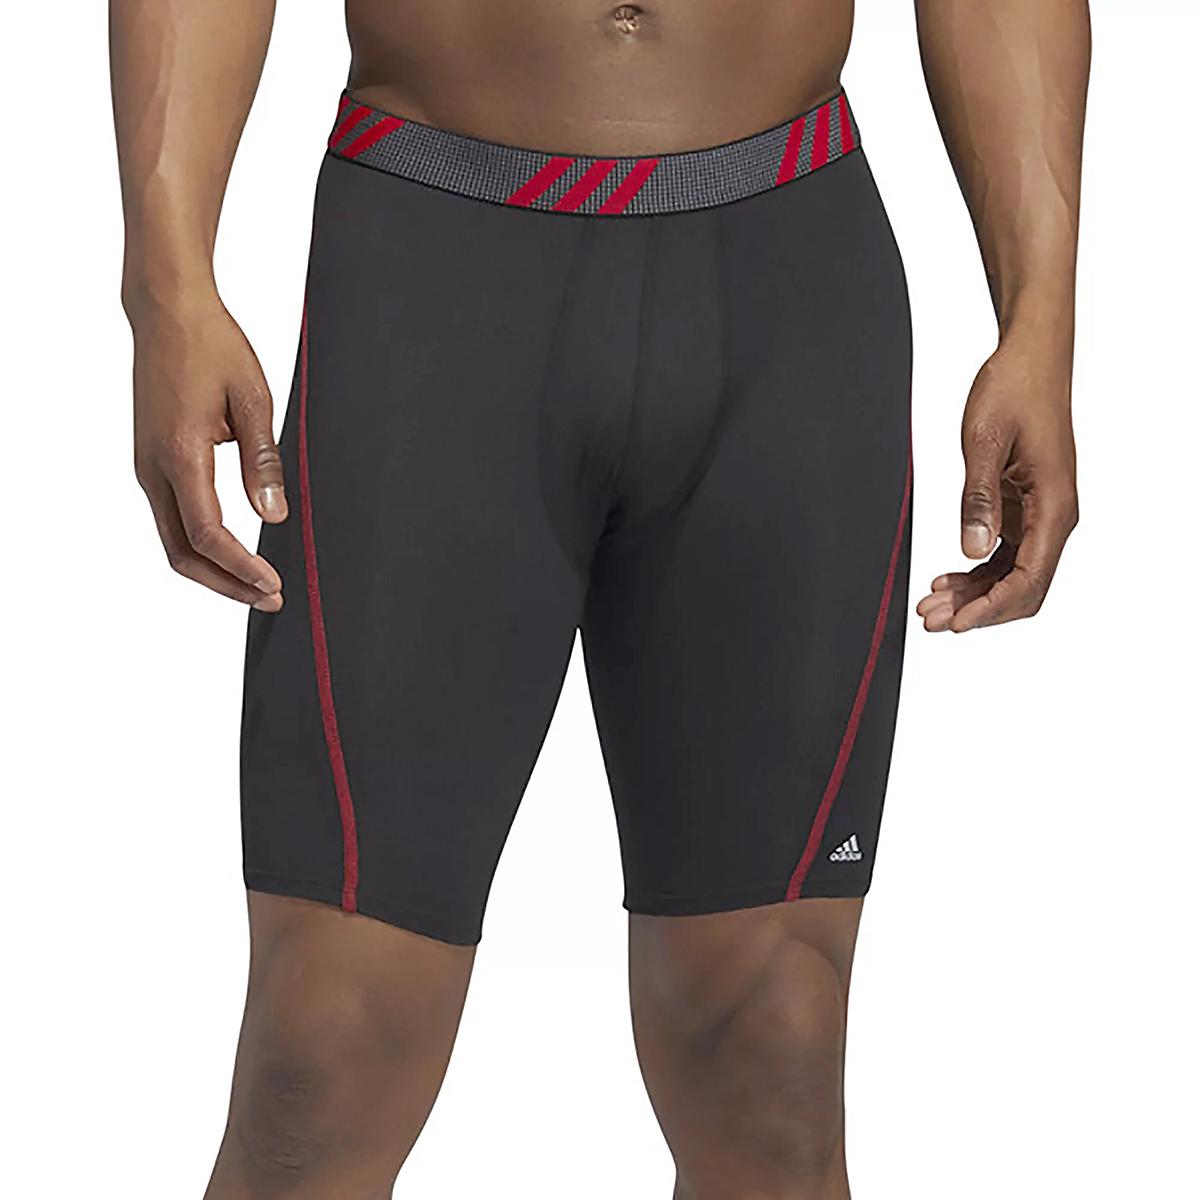 Men's Adidas Performance Mesh 3 Pack Boxer Briefs - Color: Black/Scarlet/Onix - Size: S, Black/Scarlet/Onix, large, image 3